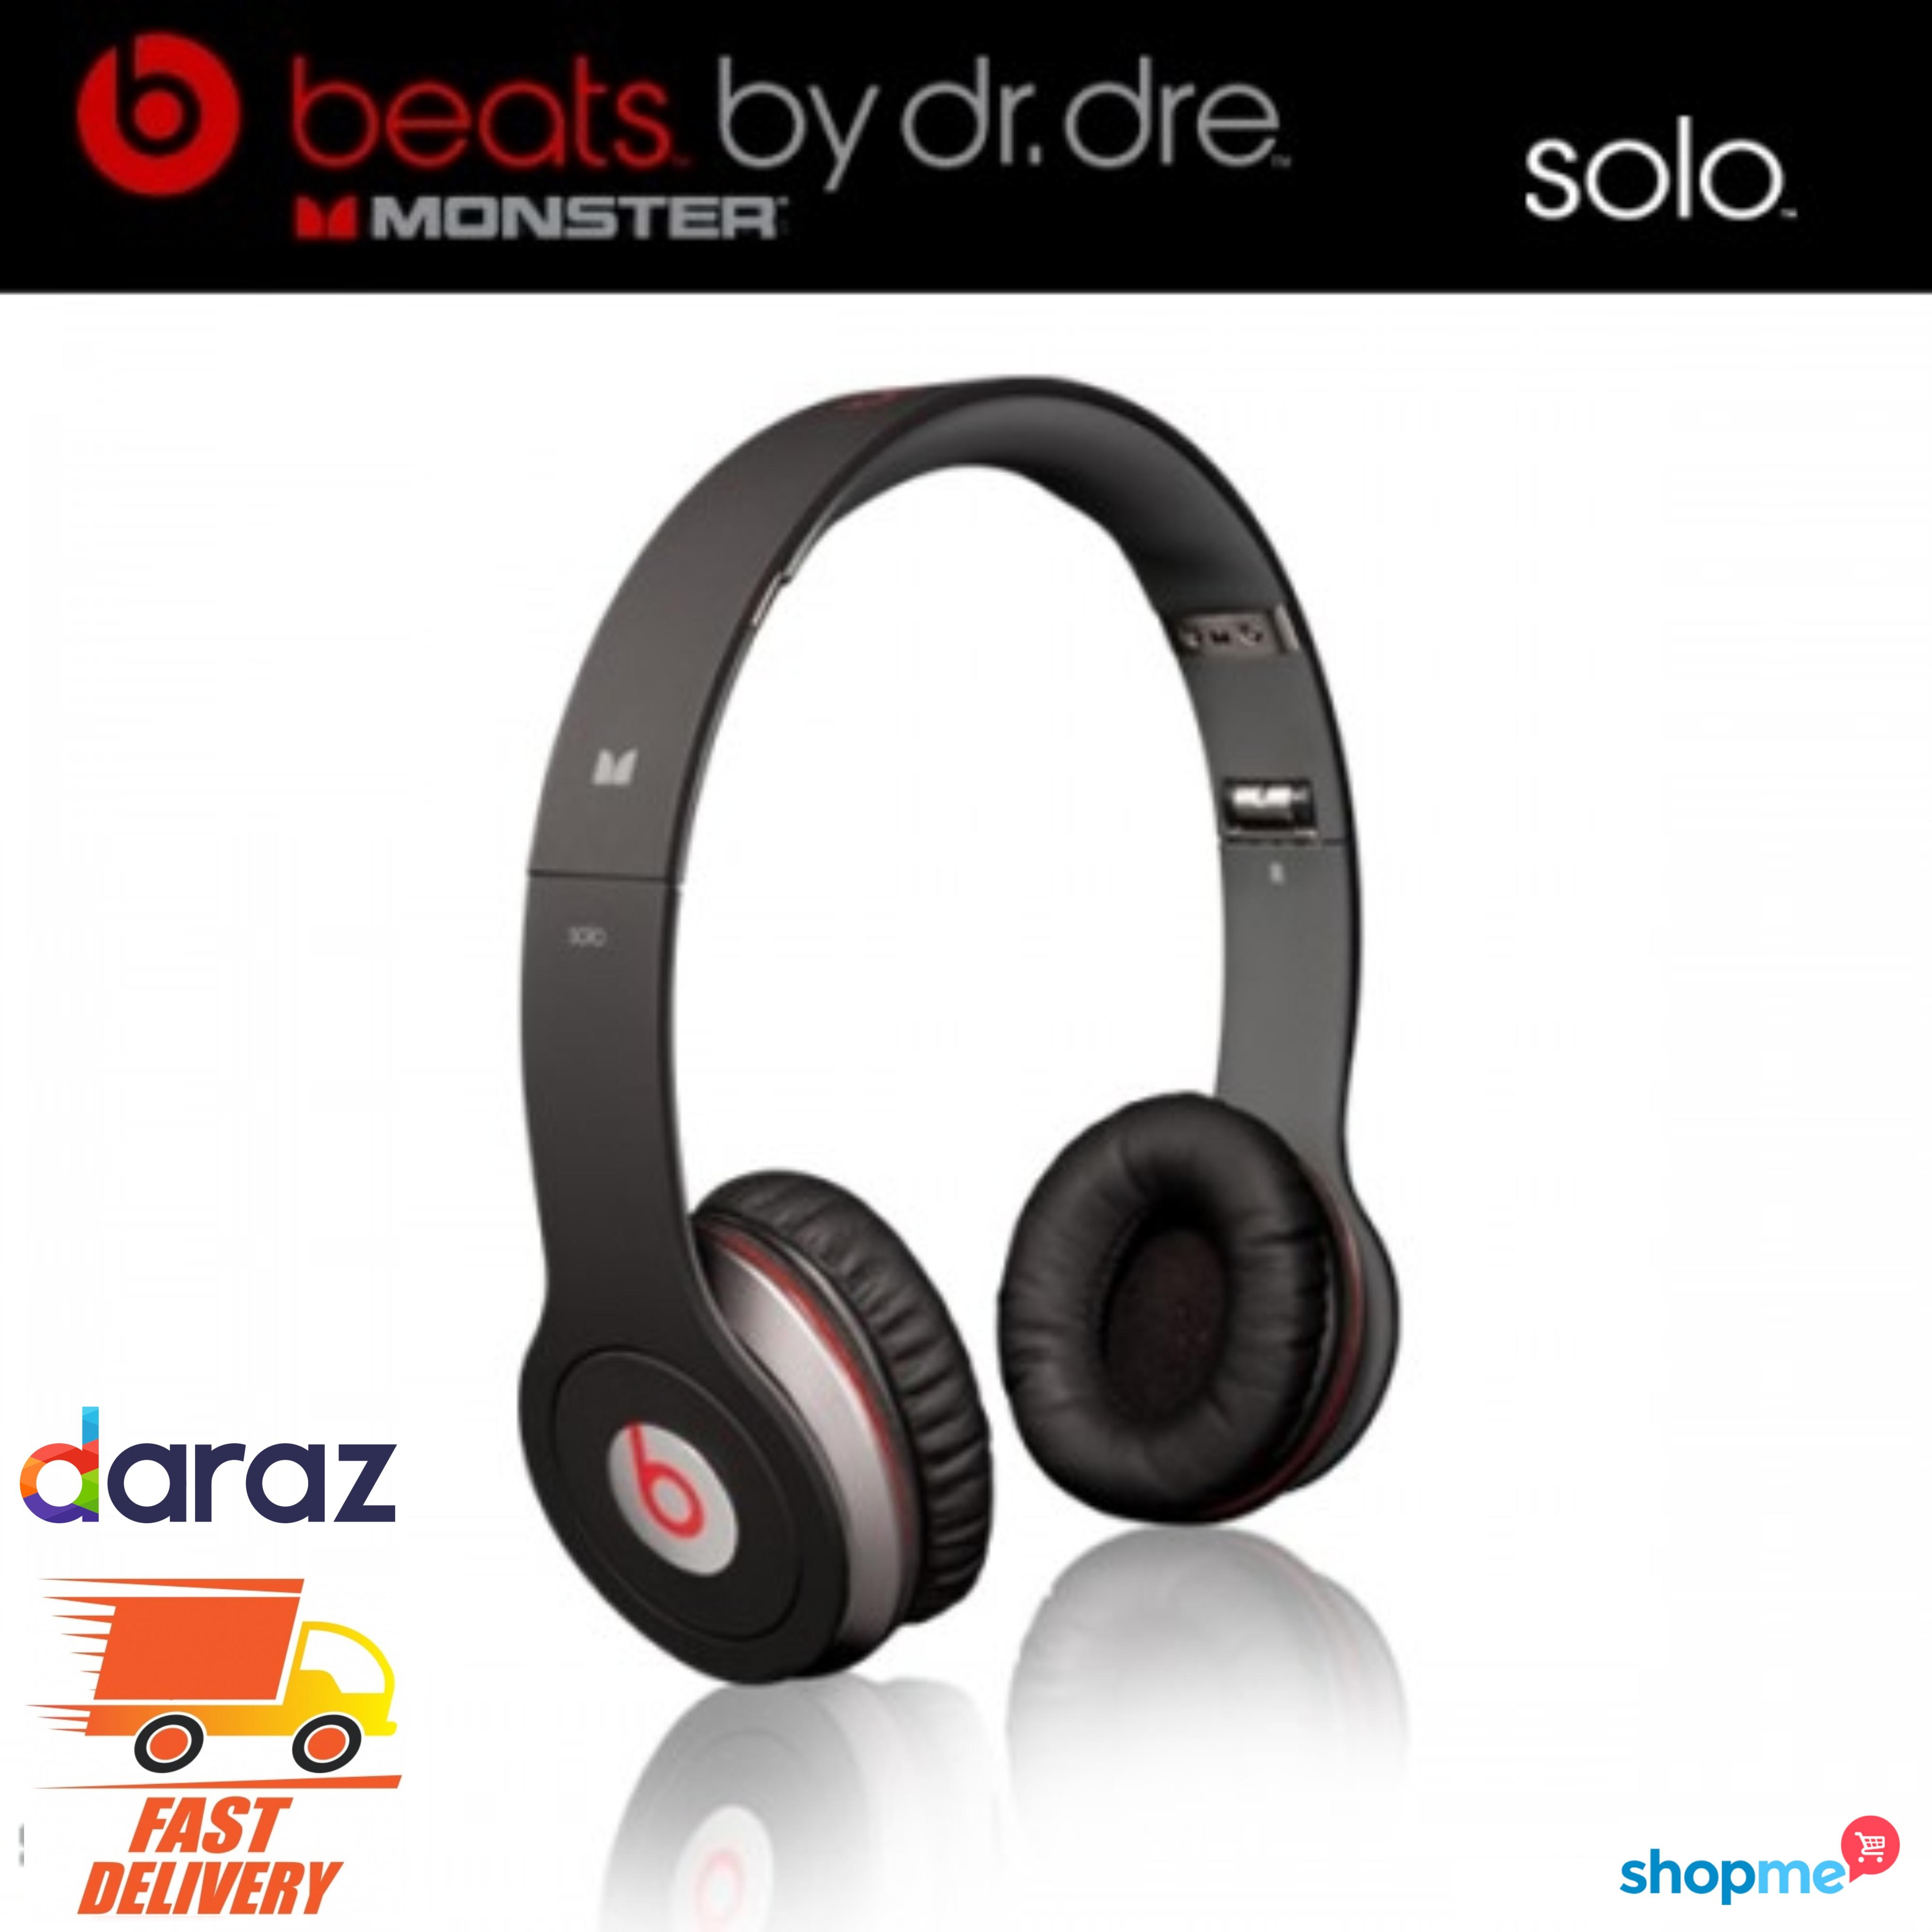 Headphones Headsets Price In Sri Lanka Headphones Headsets Emi Plans Daraz Lk